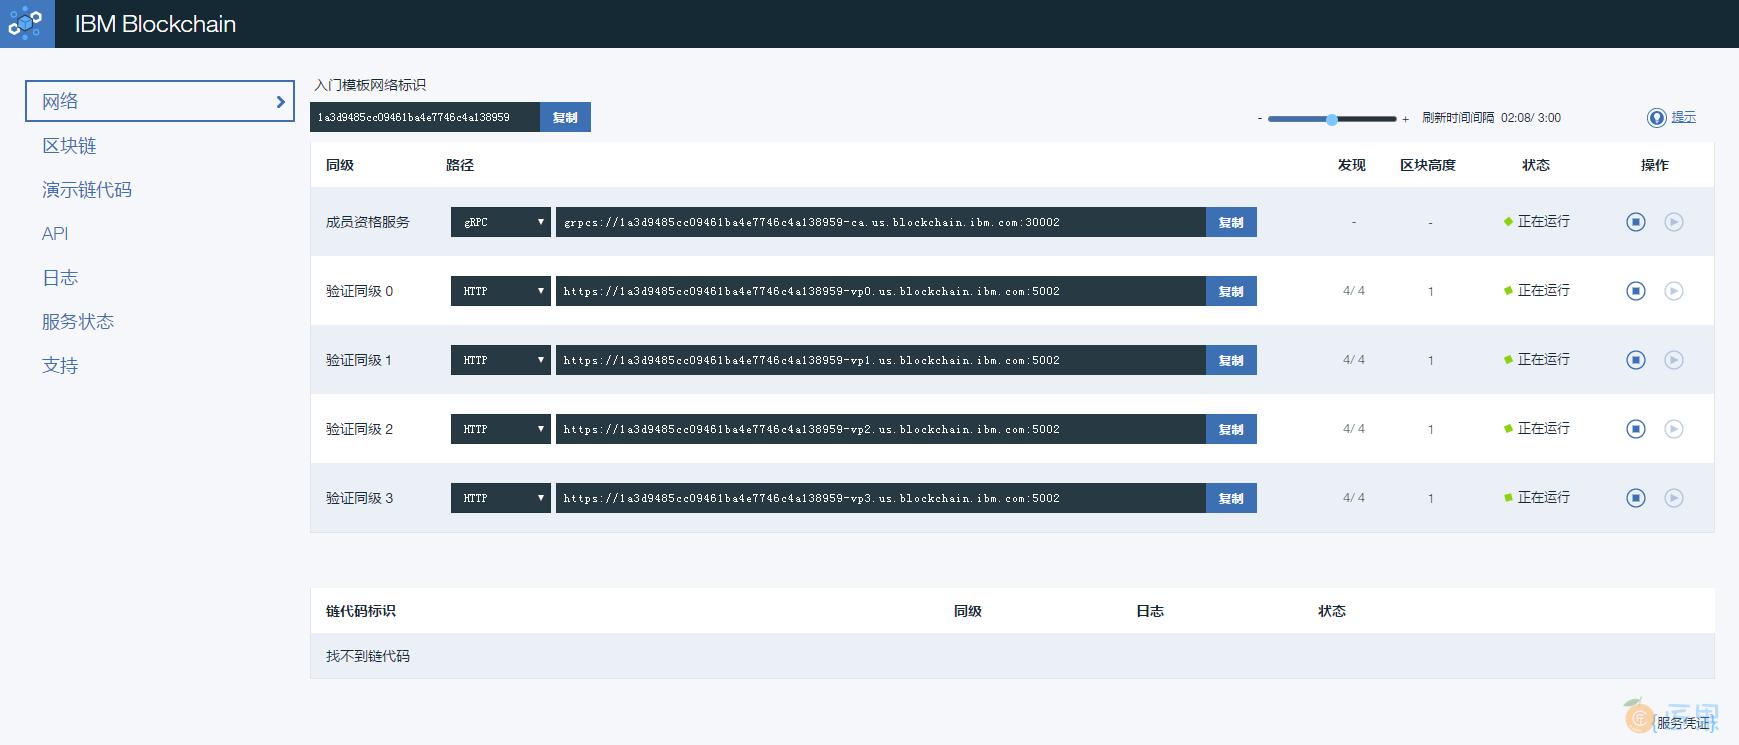 Bluemix 区块链服务仪表盘